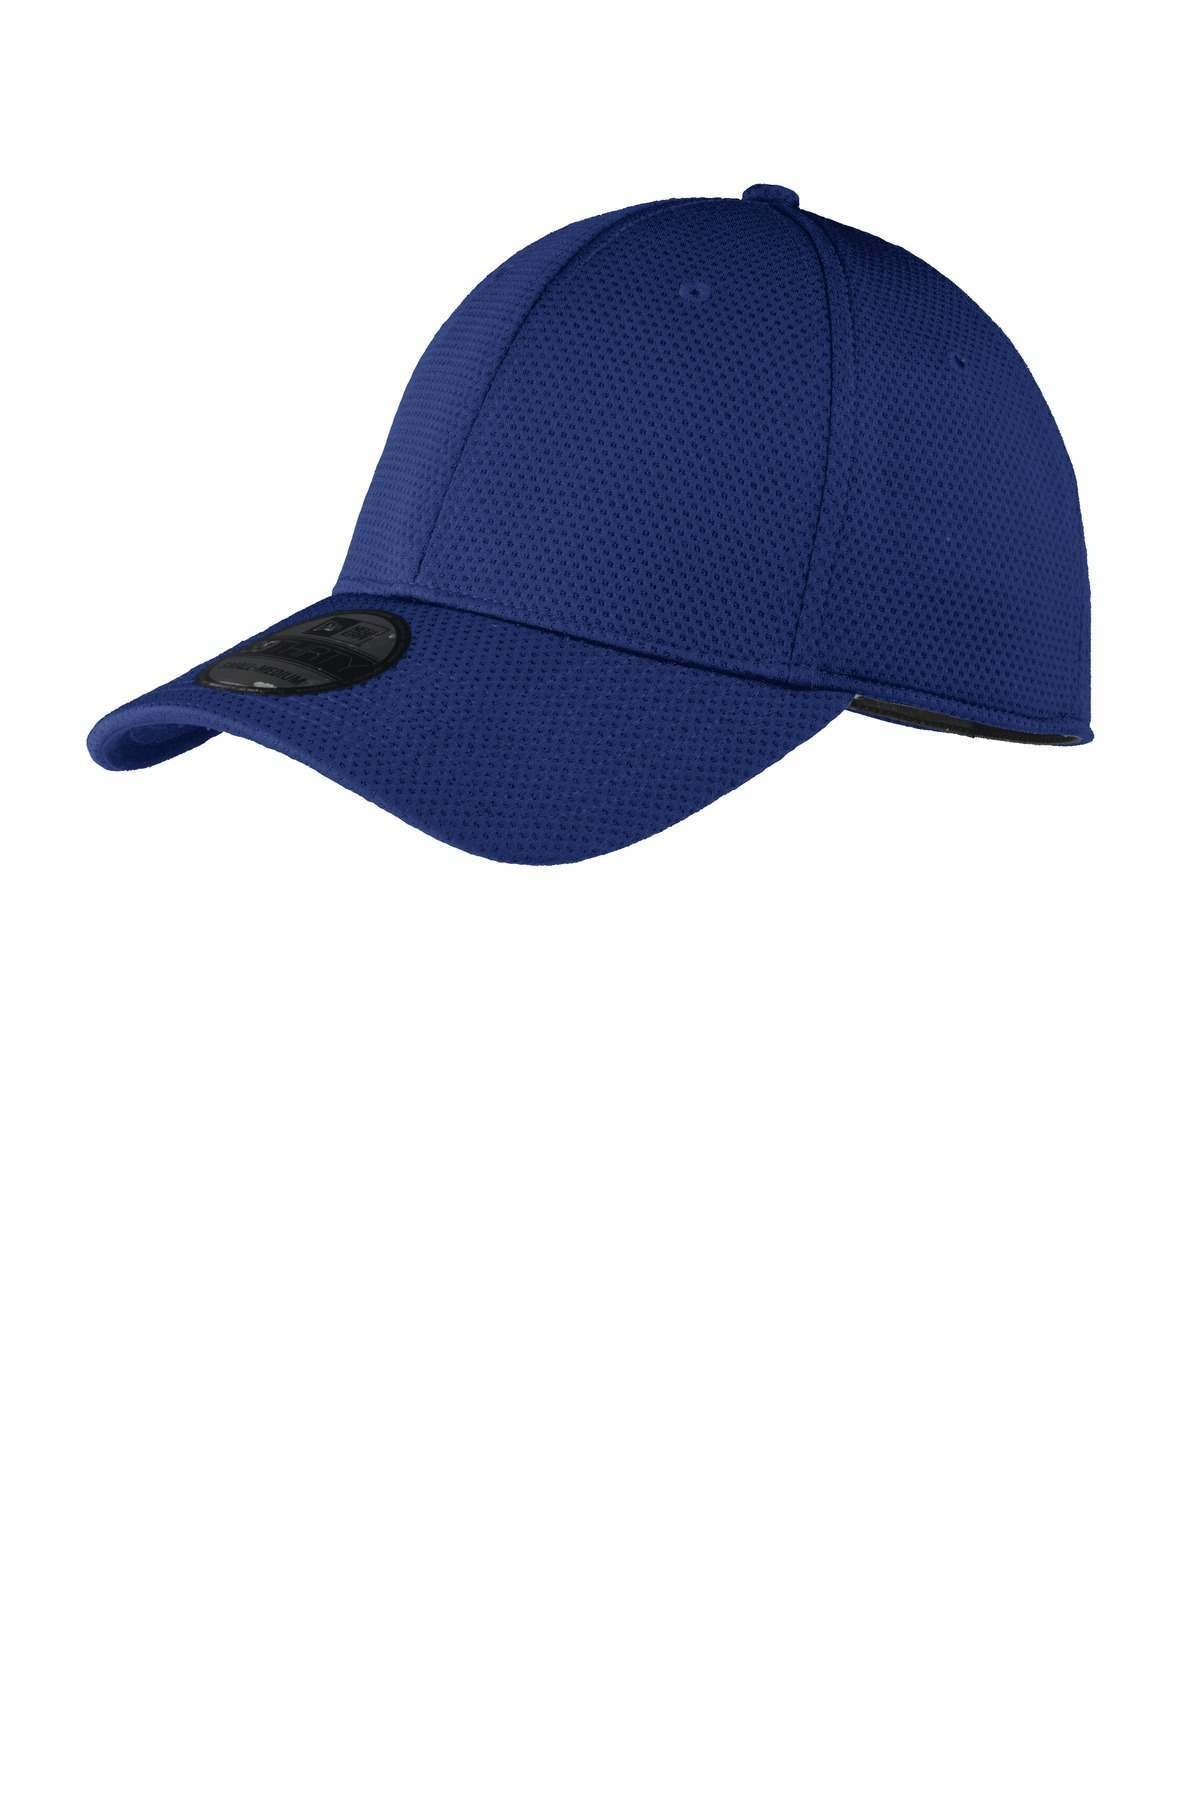 3ba076e38d83d9 New Era® Tech Mesh Cap - New Era - Brands